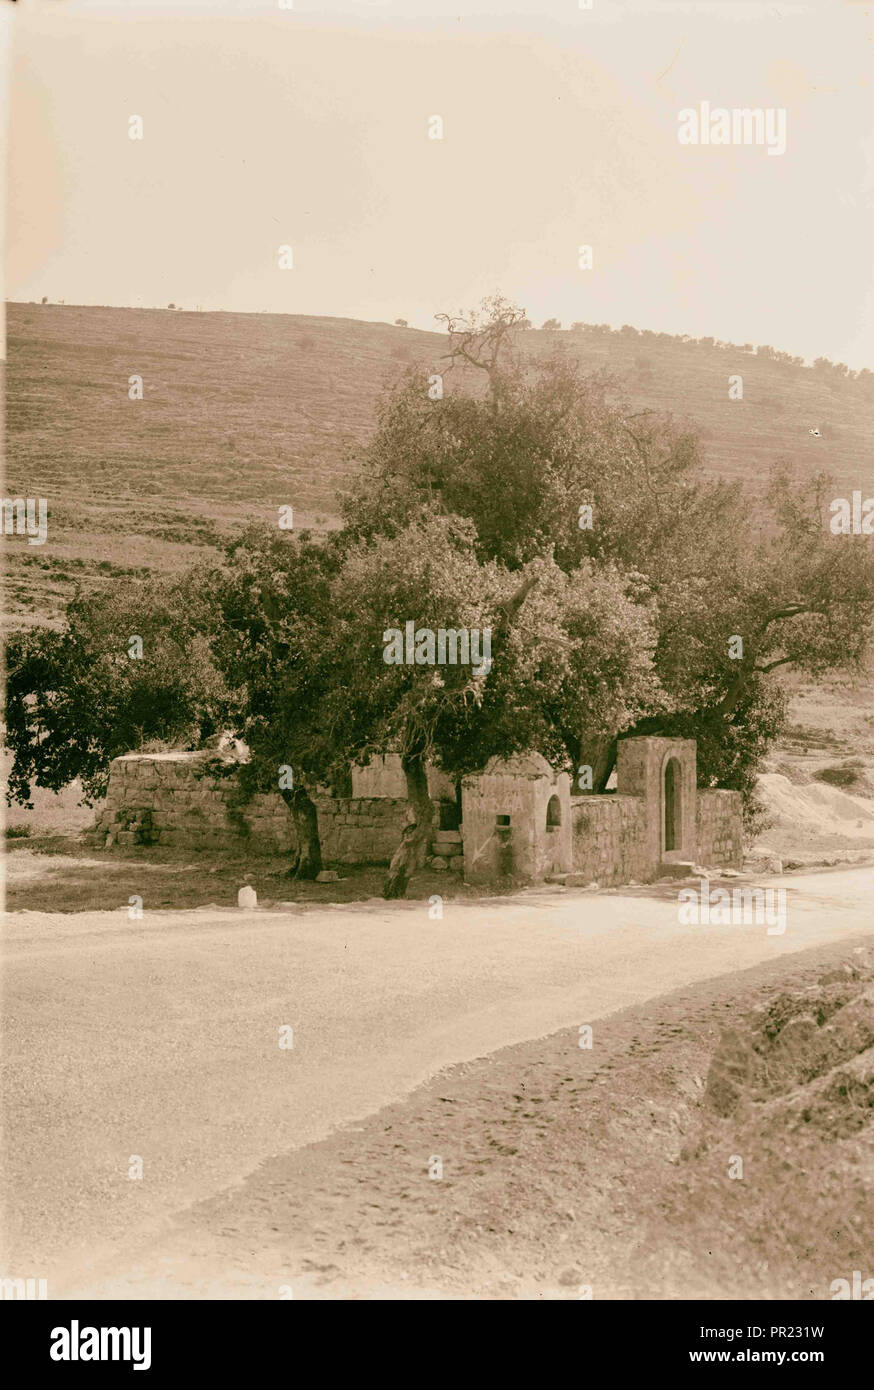 Wili [i.e., weli] at Bab el-Wad. 1934, Israel - Stock Image